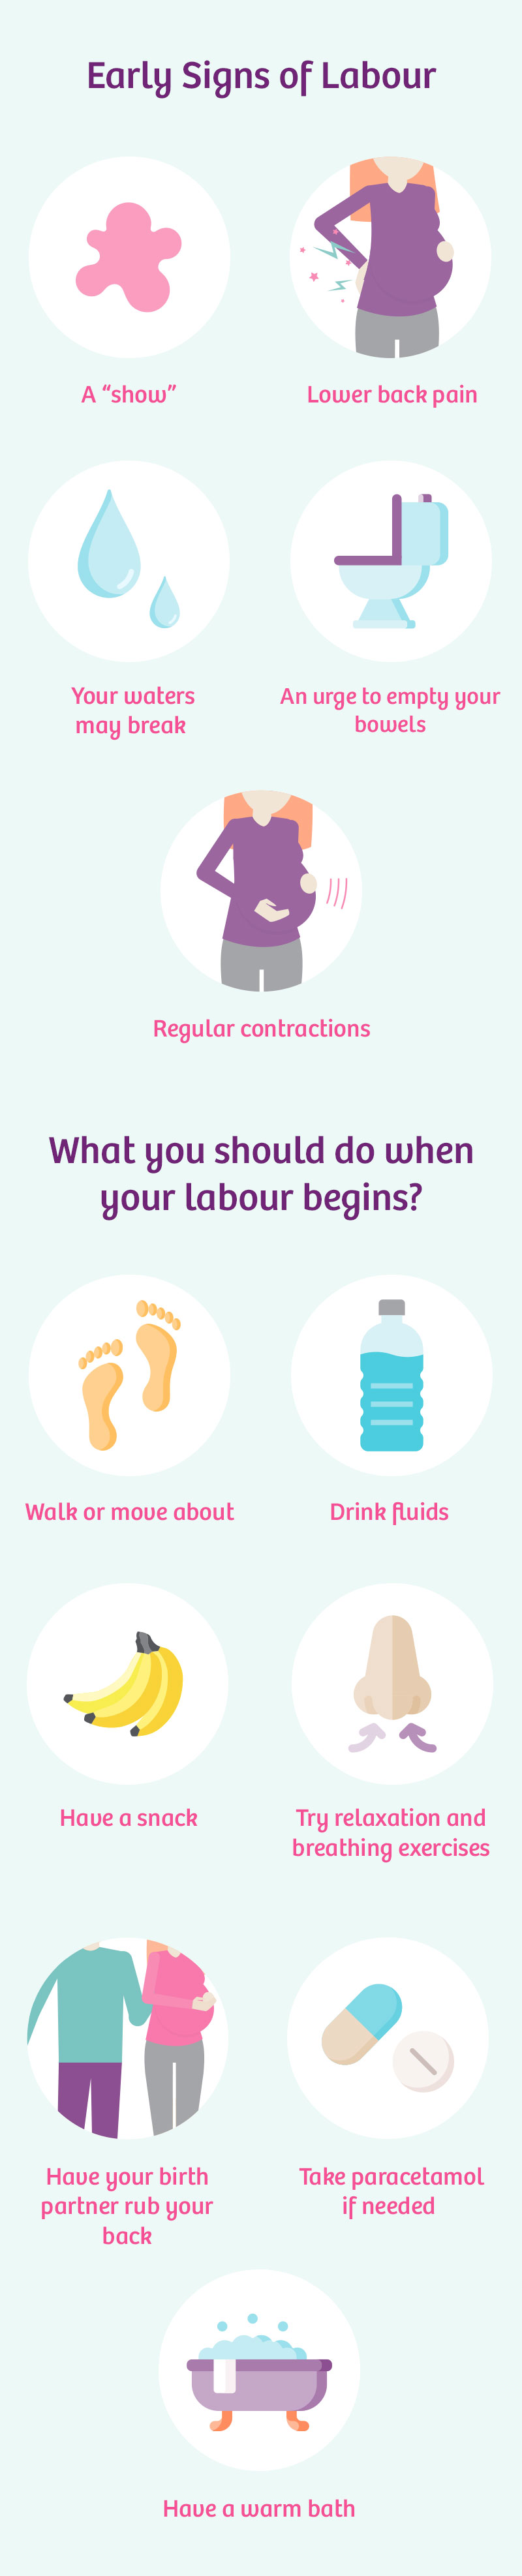 labour starts